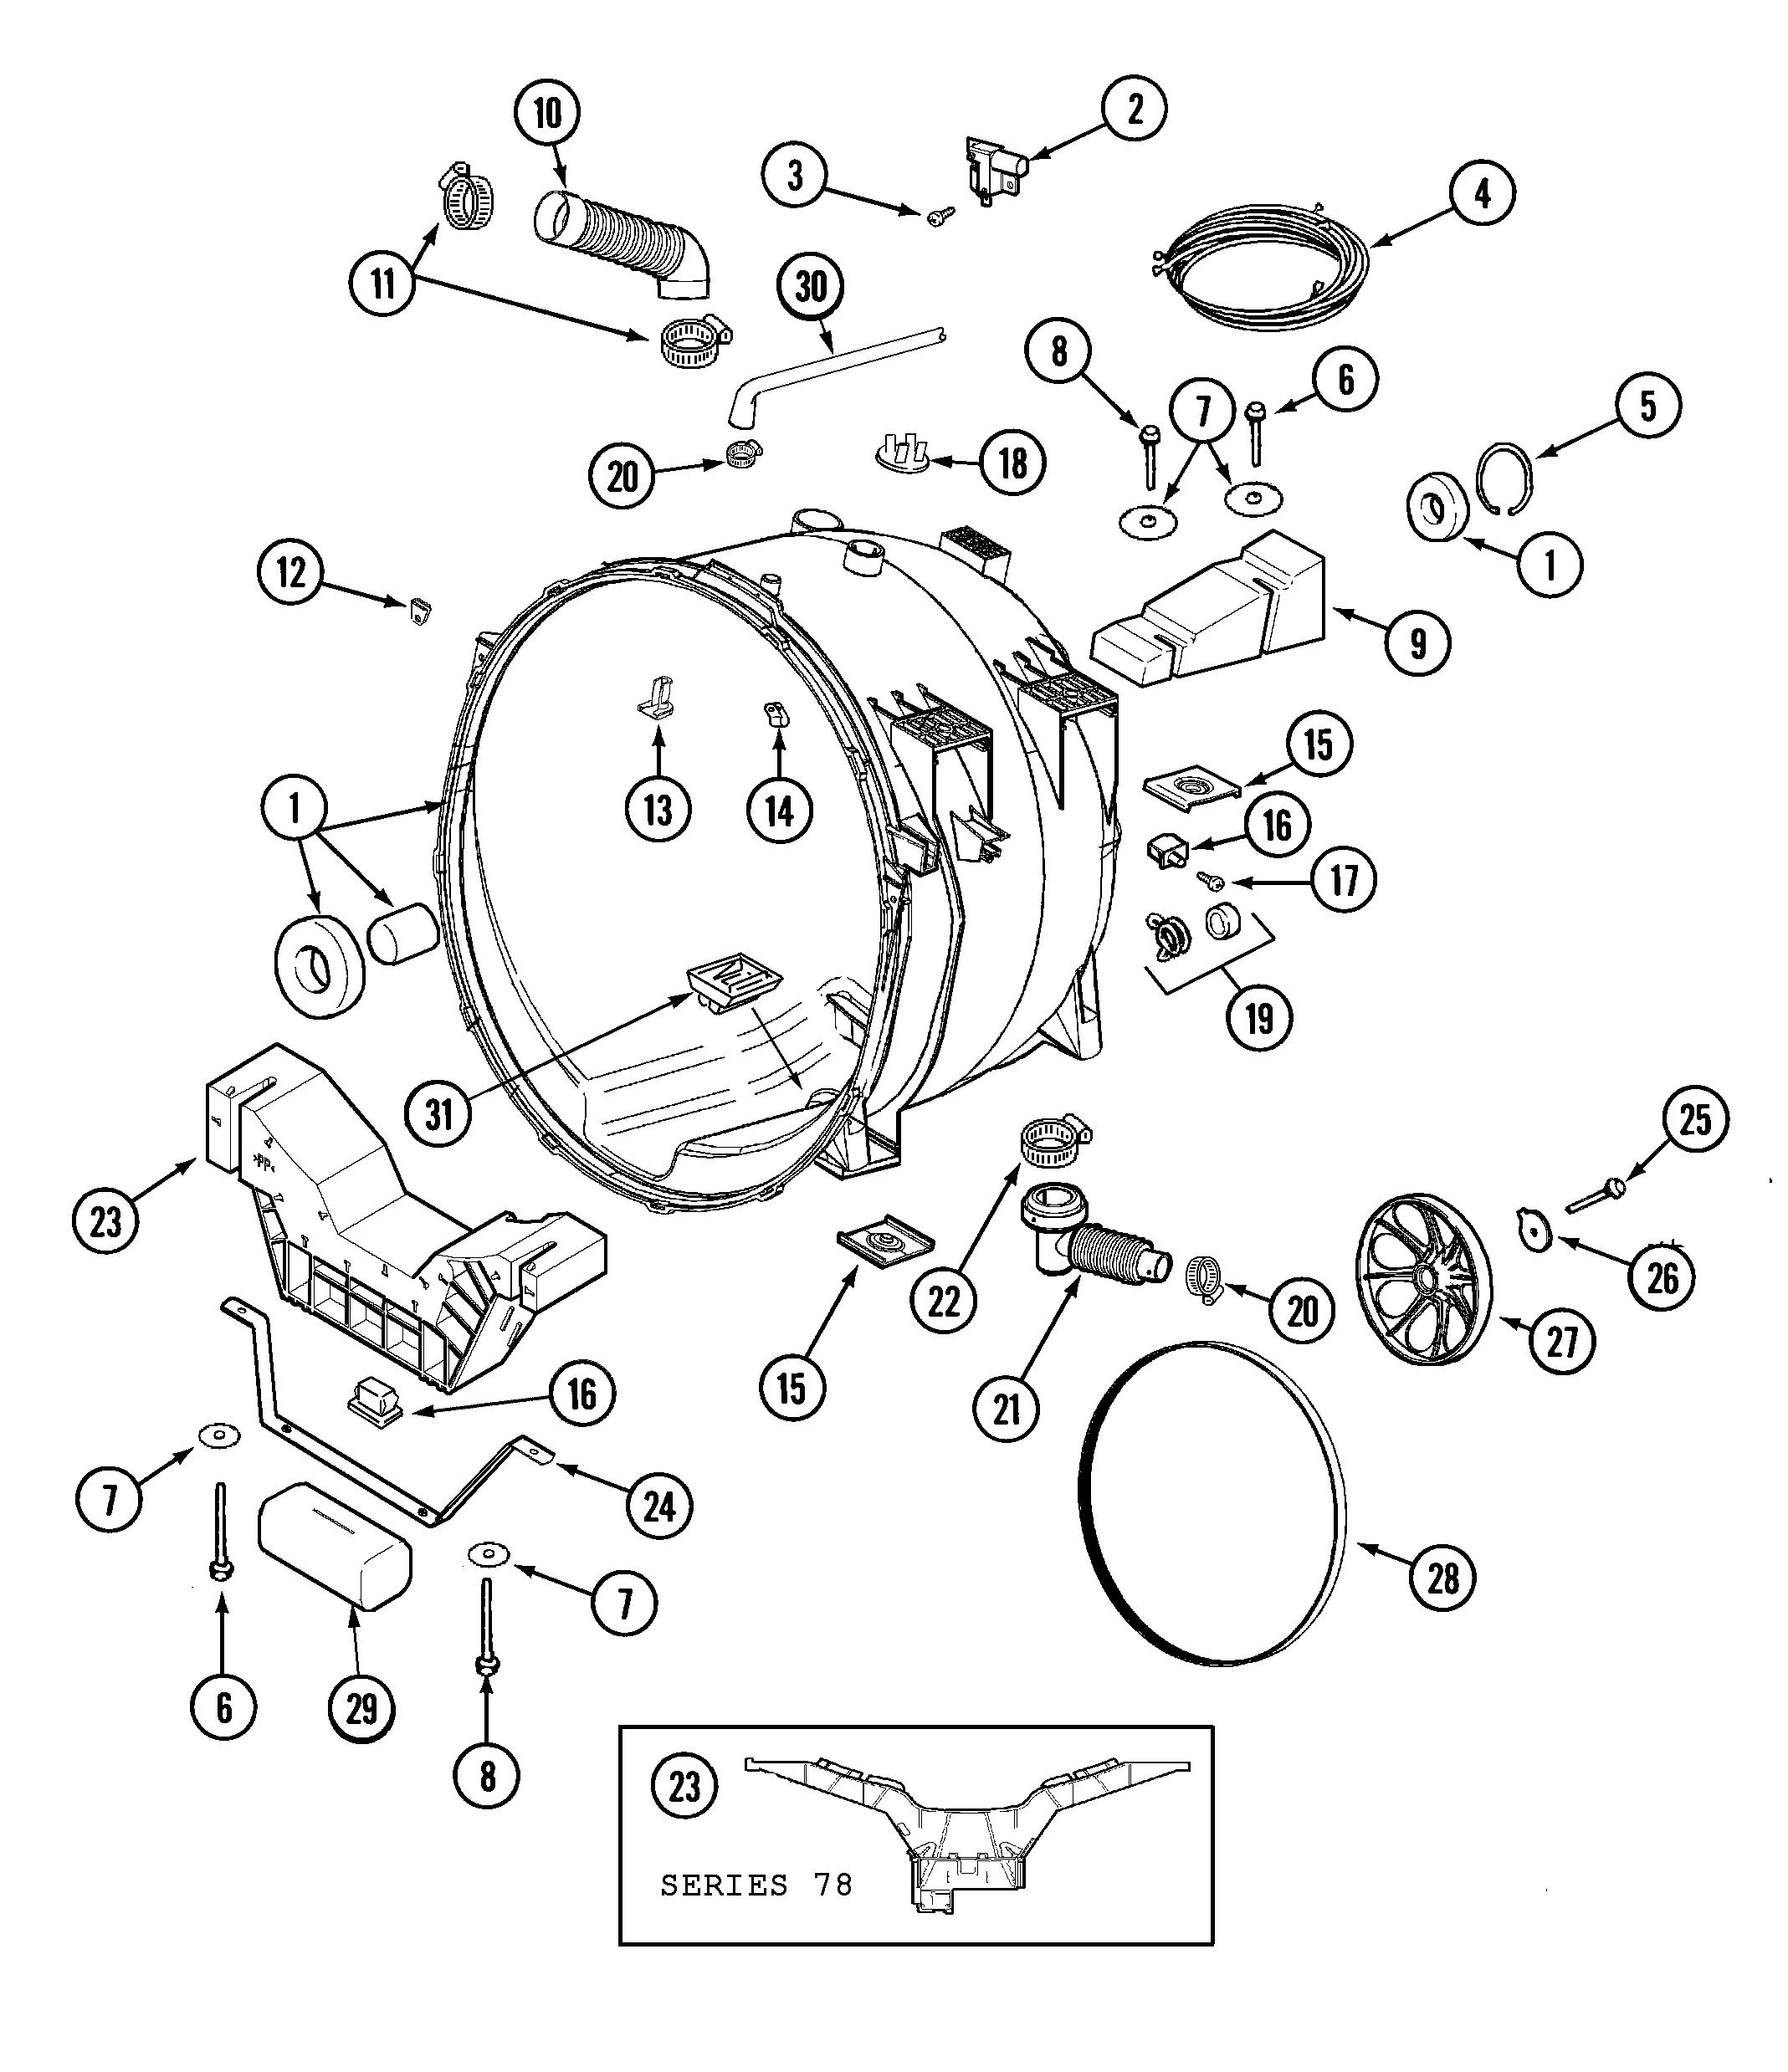 maytag neptune washer parts diagram Mini Maglite Flashlight Parts